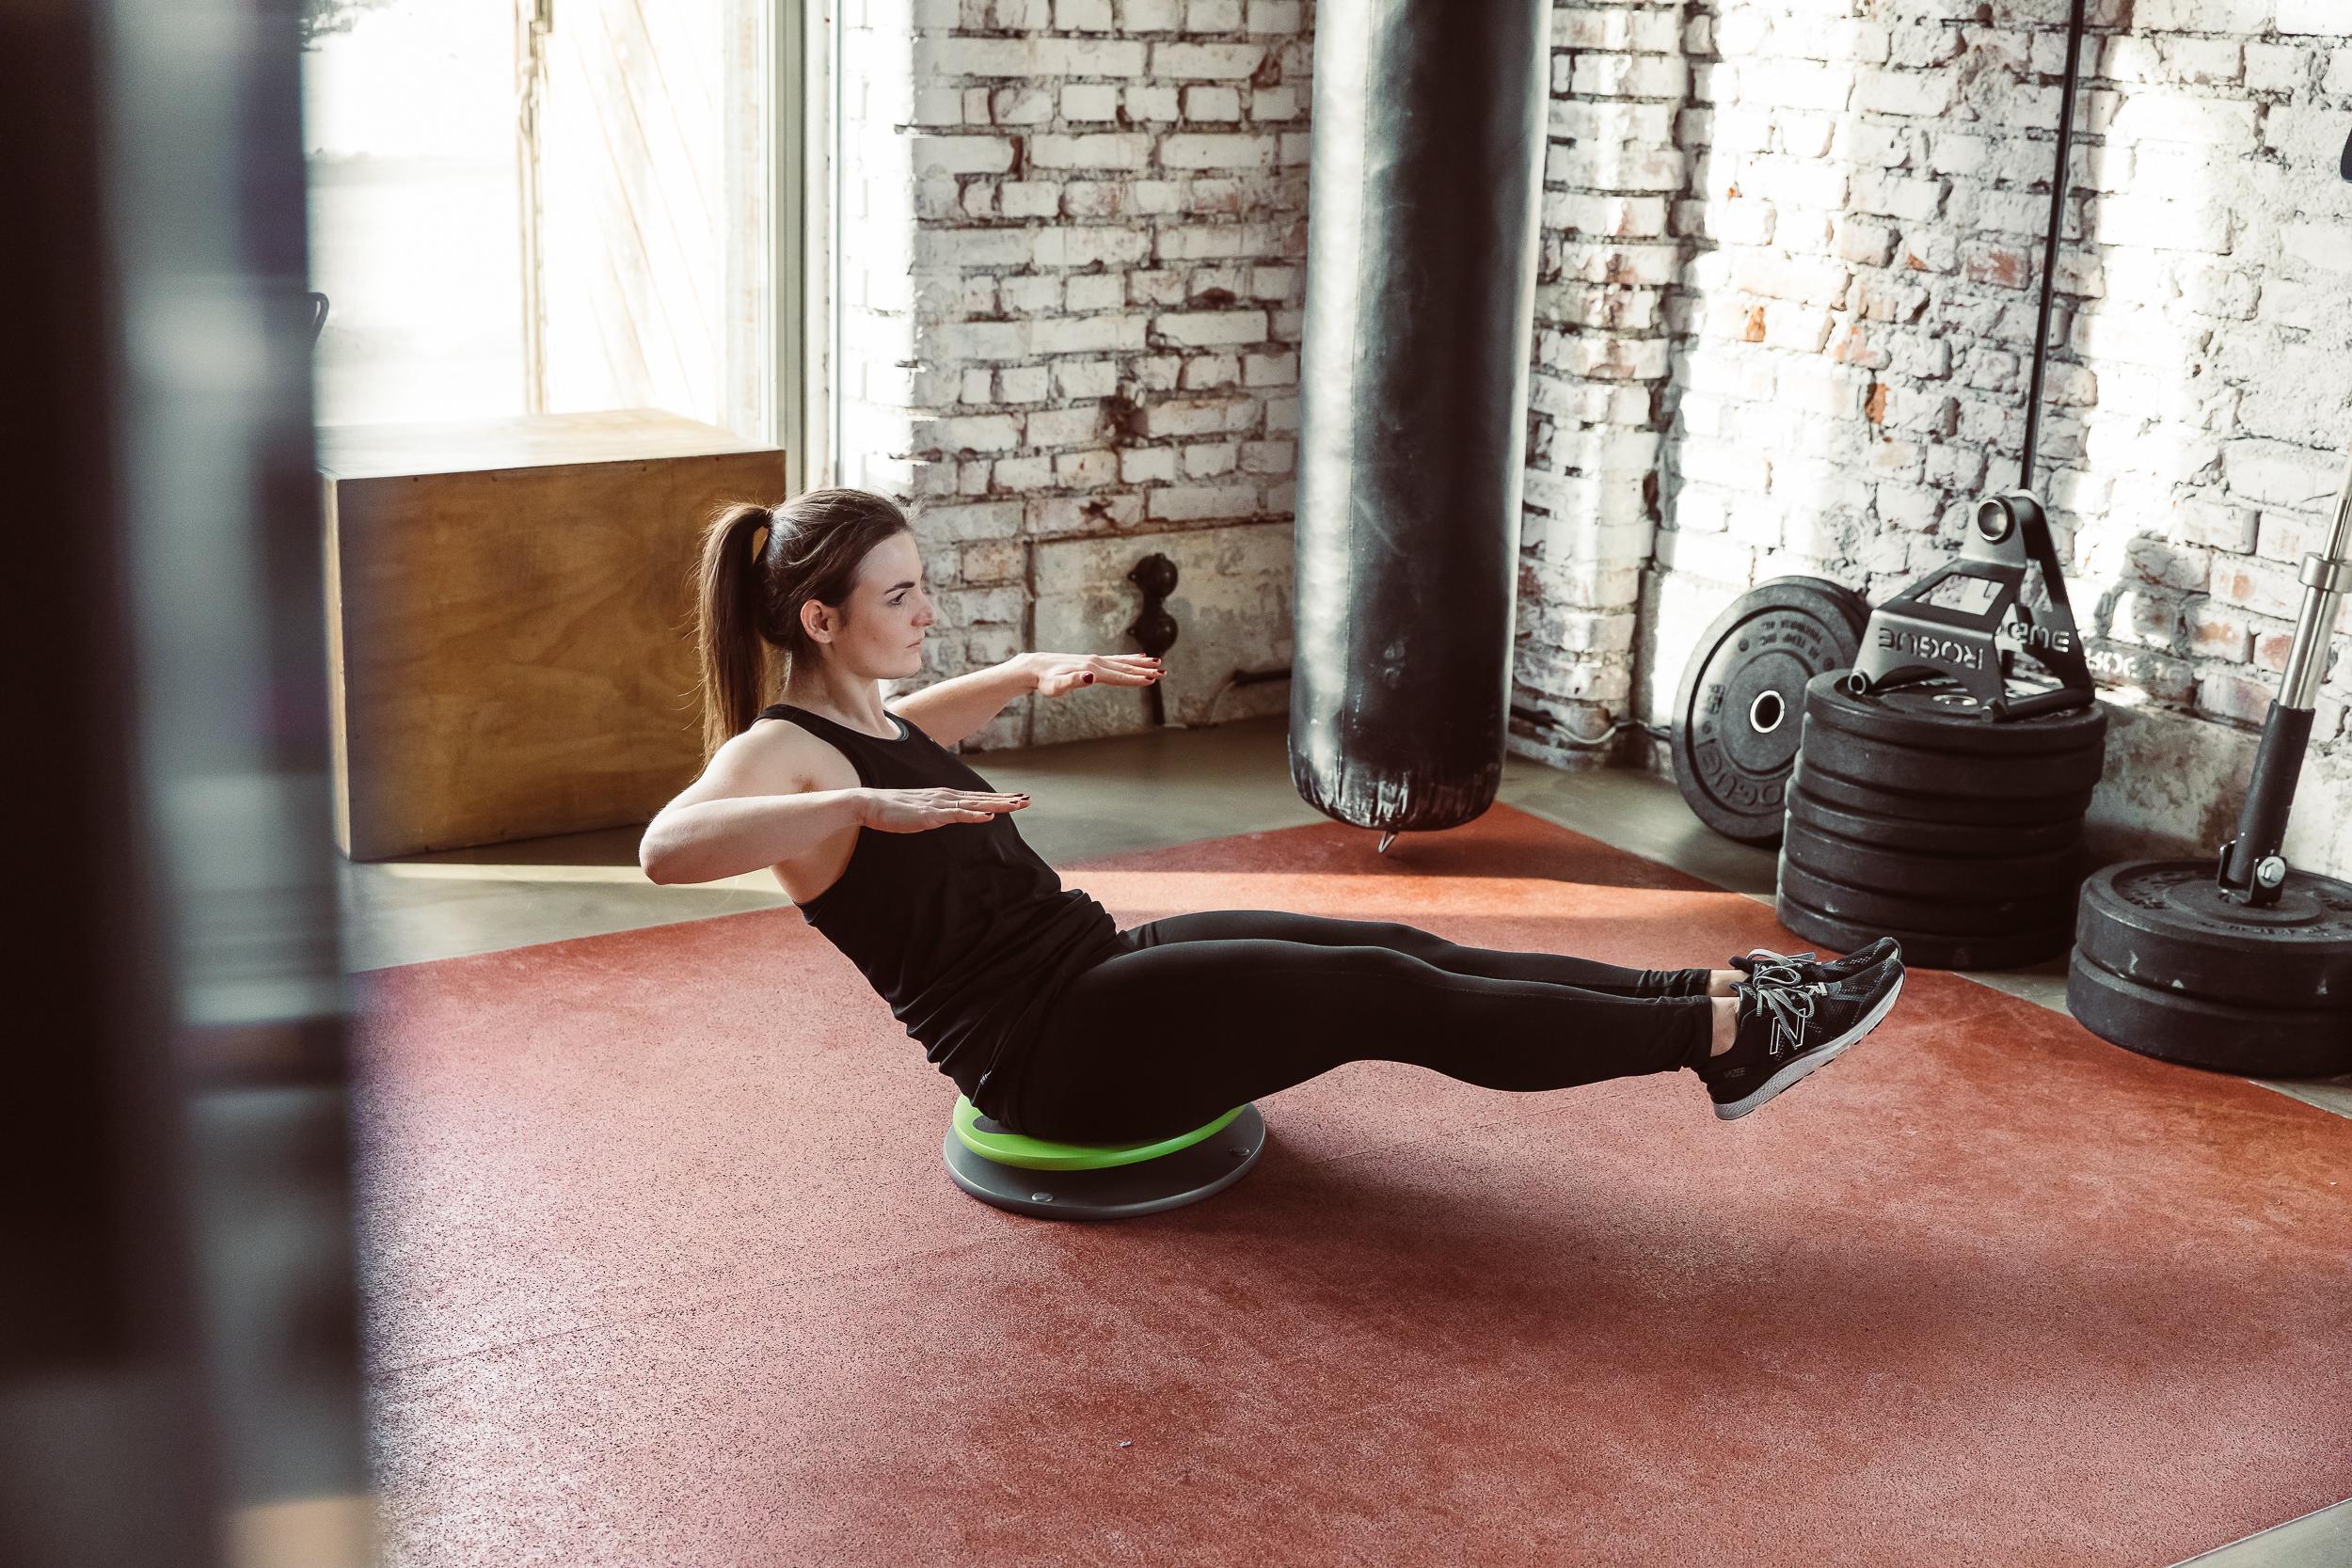 mft-sportssupport-training-0435